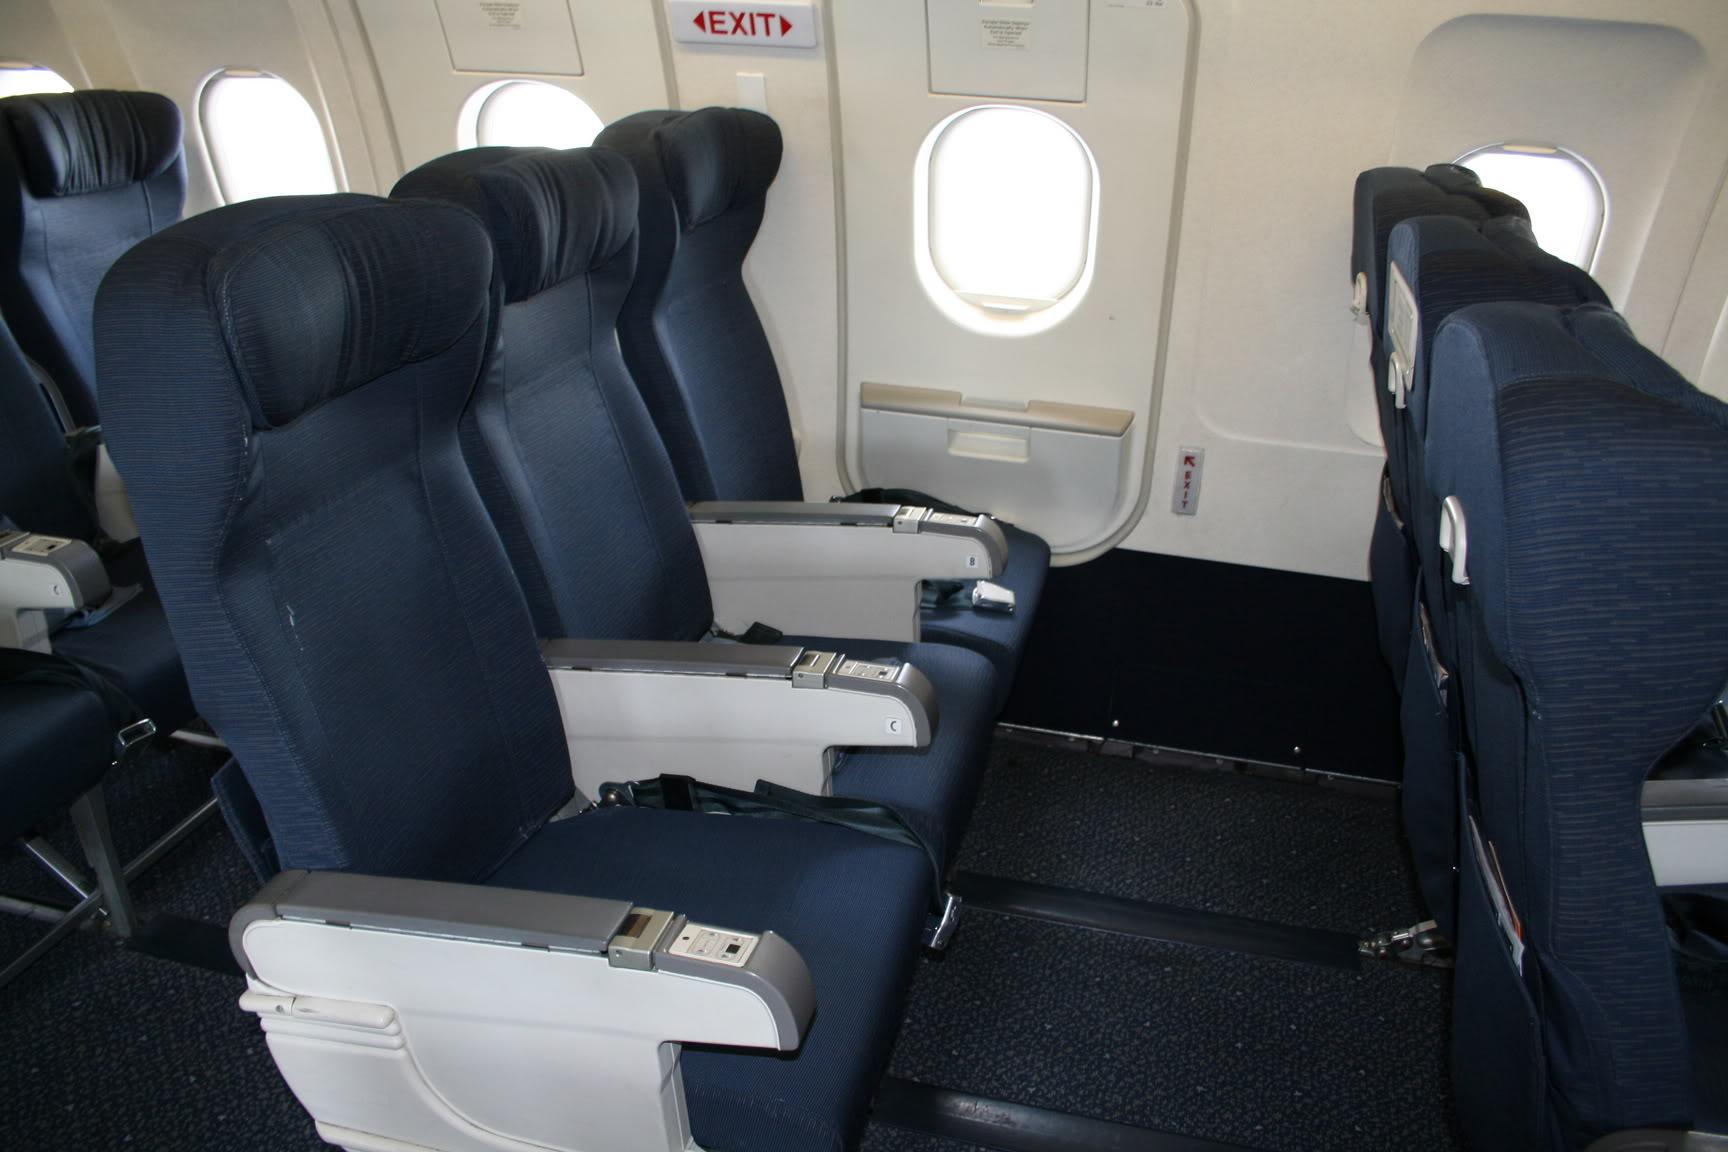 How To Sleep On Redeye Flights